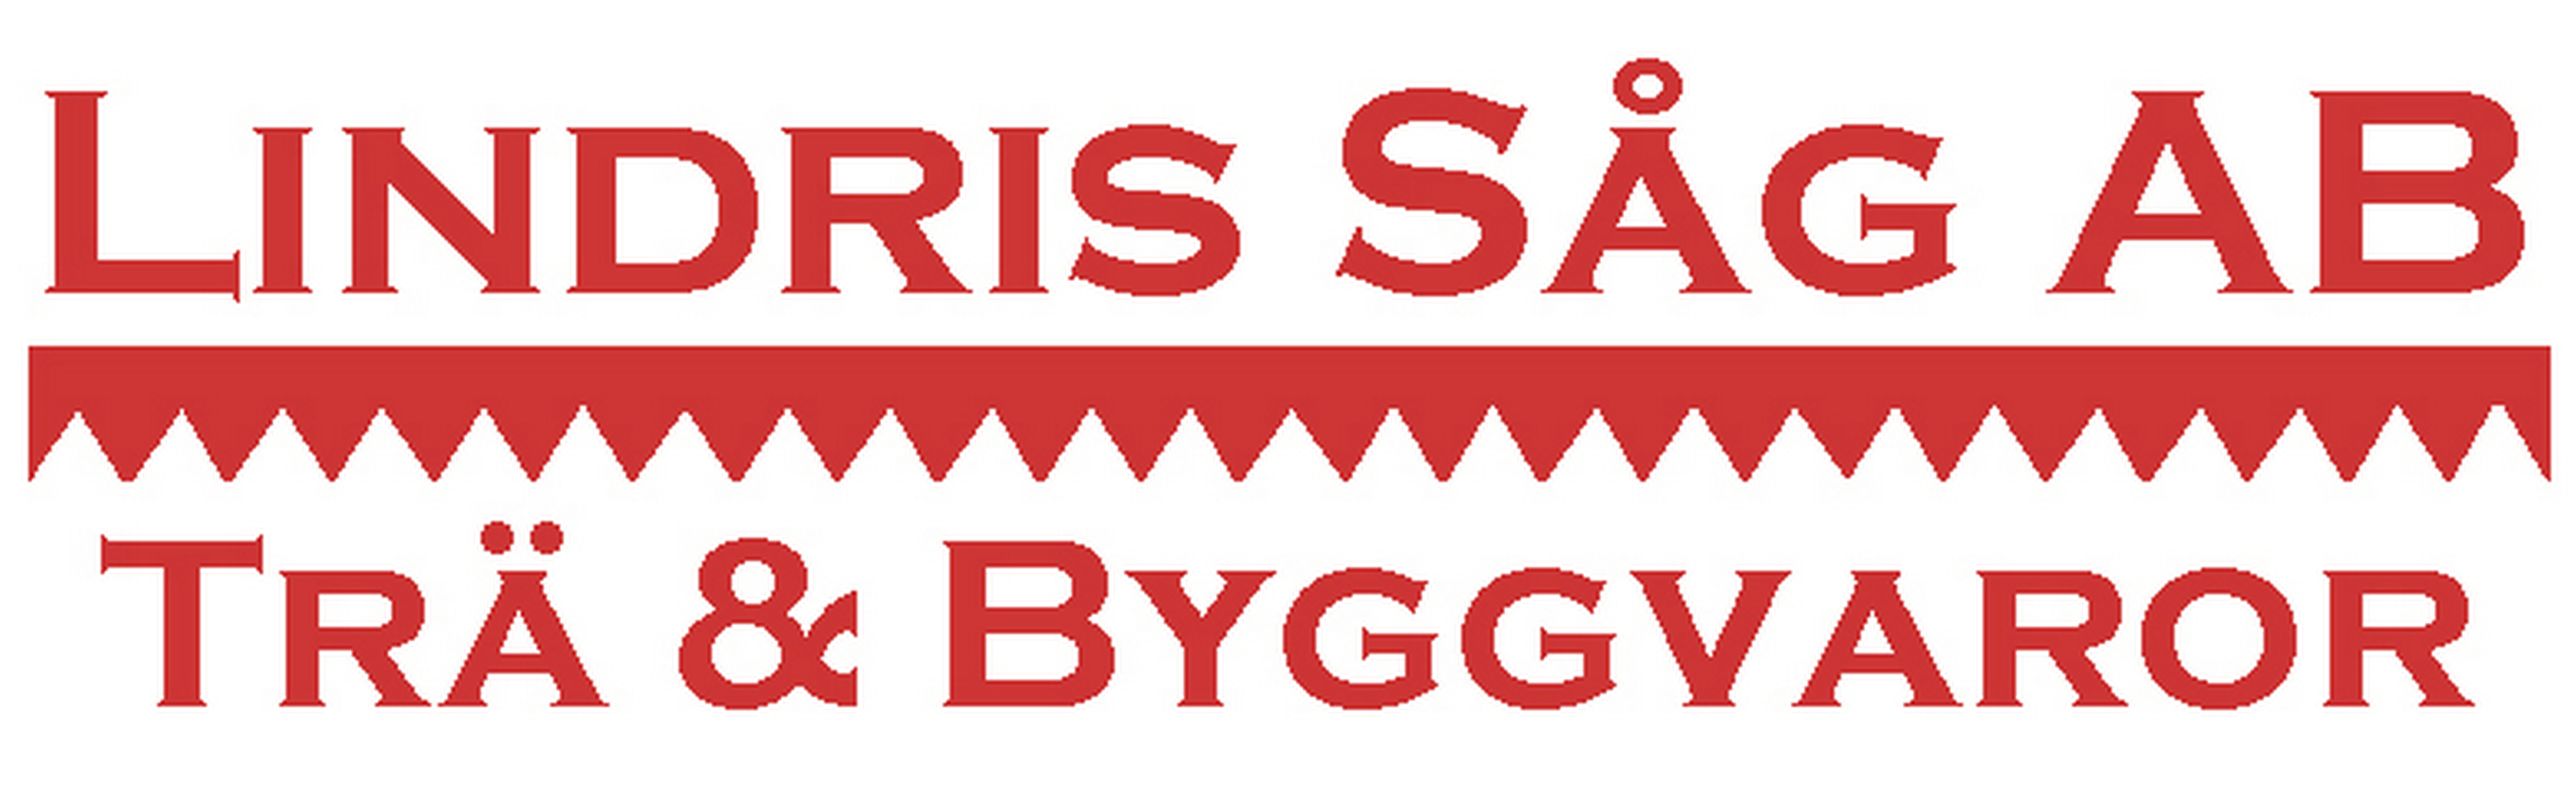 logotyp Lindris Såg AB